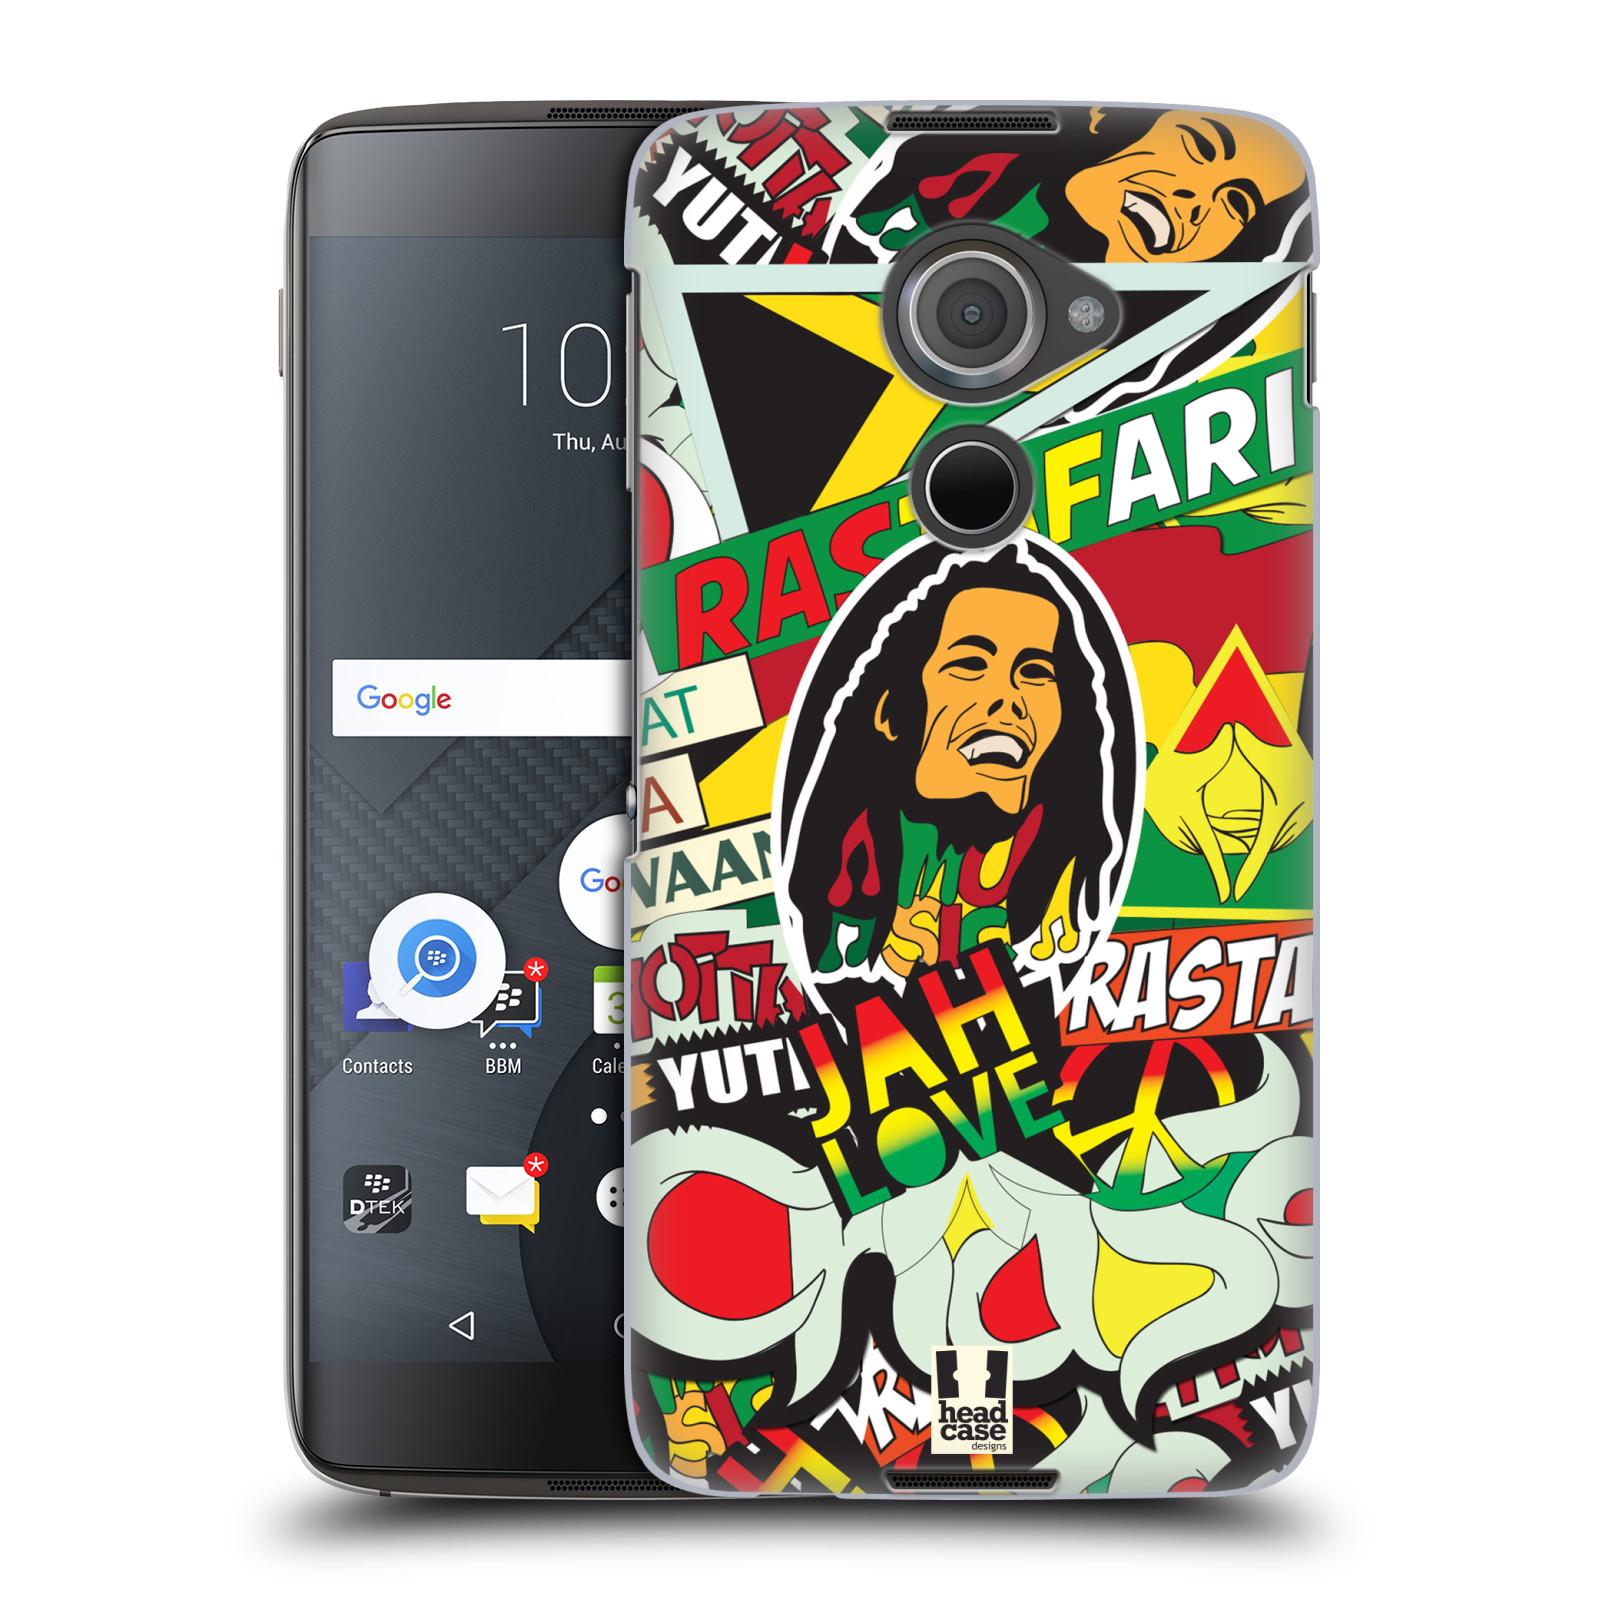 Plastové pouzdro na mobil Blackberry DTEK60 (Argon) - Head Case RASTA (Plastový kryt či obal na mobilní telefon Blackberry DTEK60 (Argon))